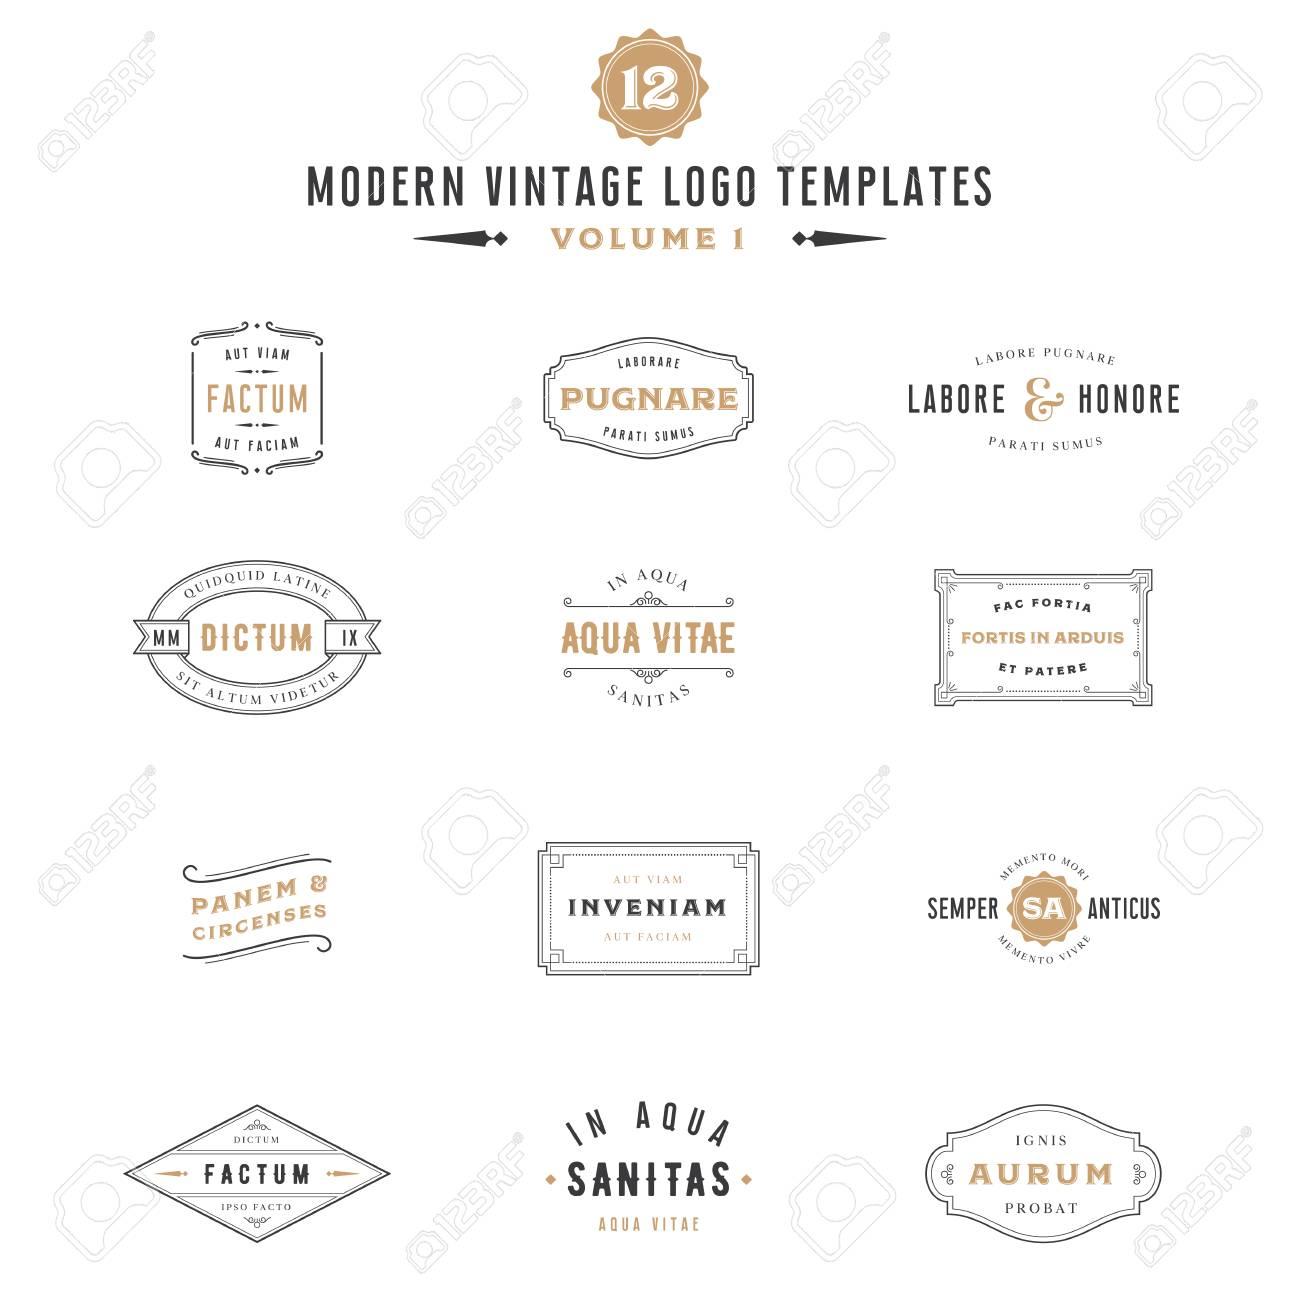 vintage labels and logo templates bundle collection of vintage